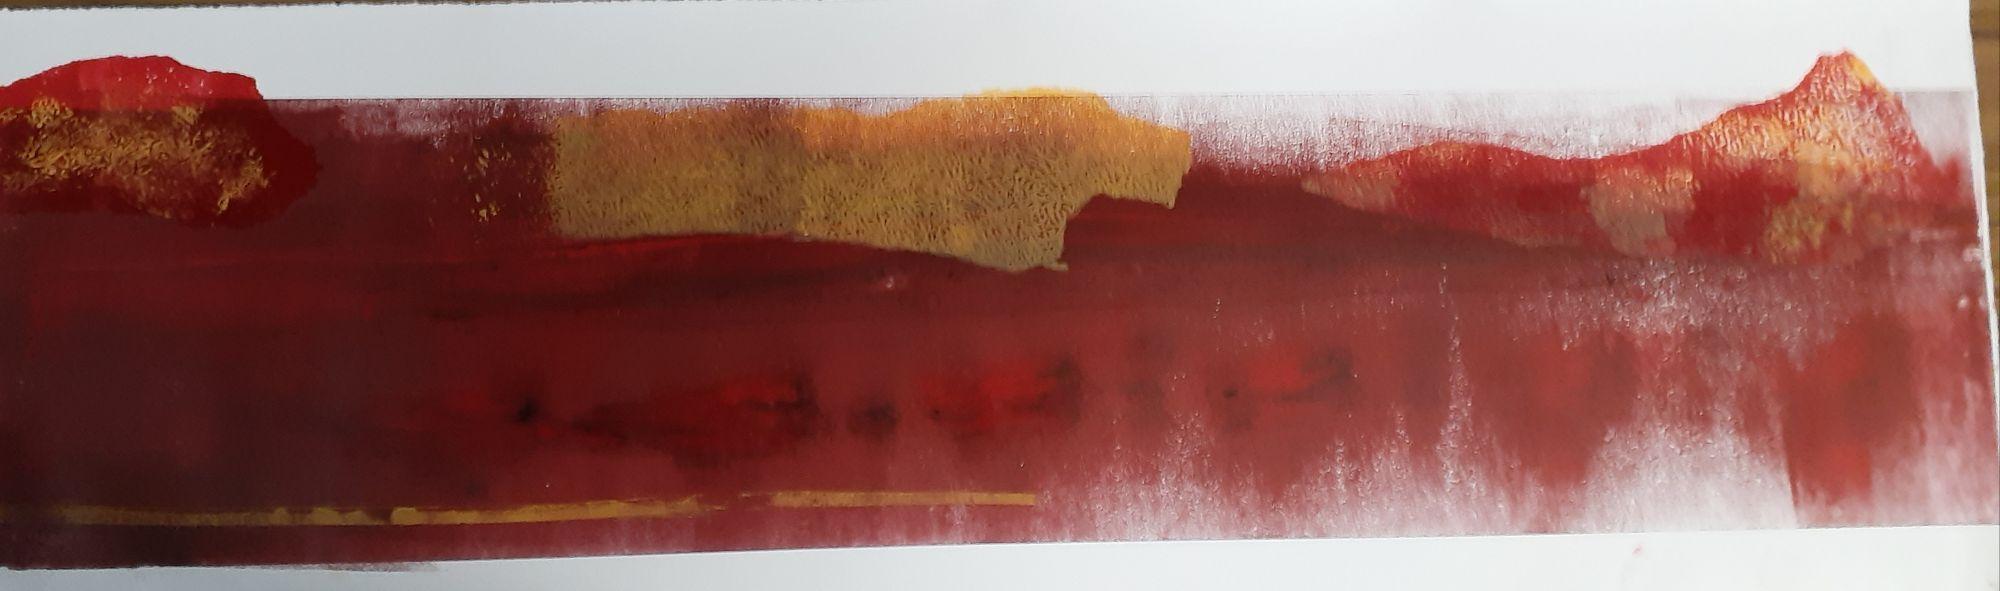 Lynn Scott-Cumming, as yet untitled, 2020, mixed media relief print